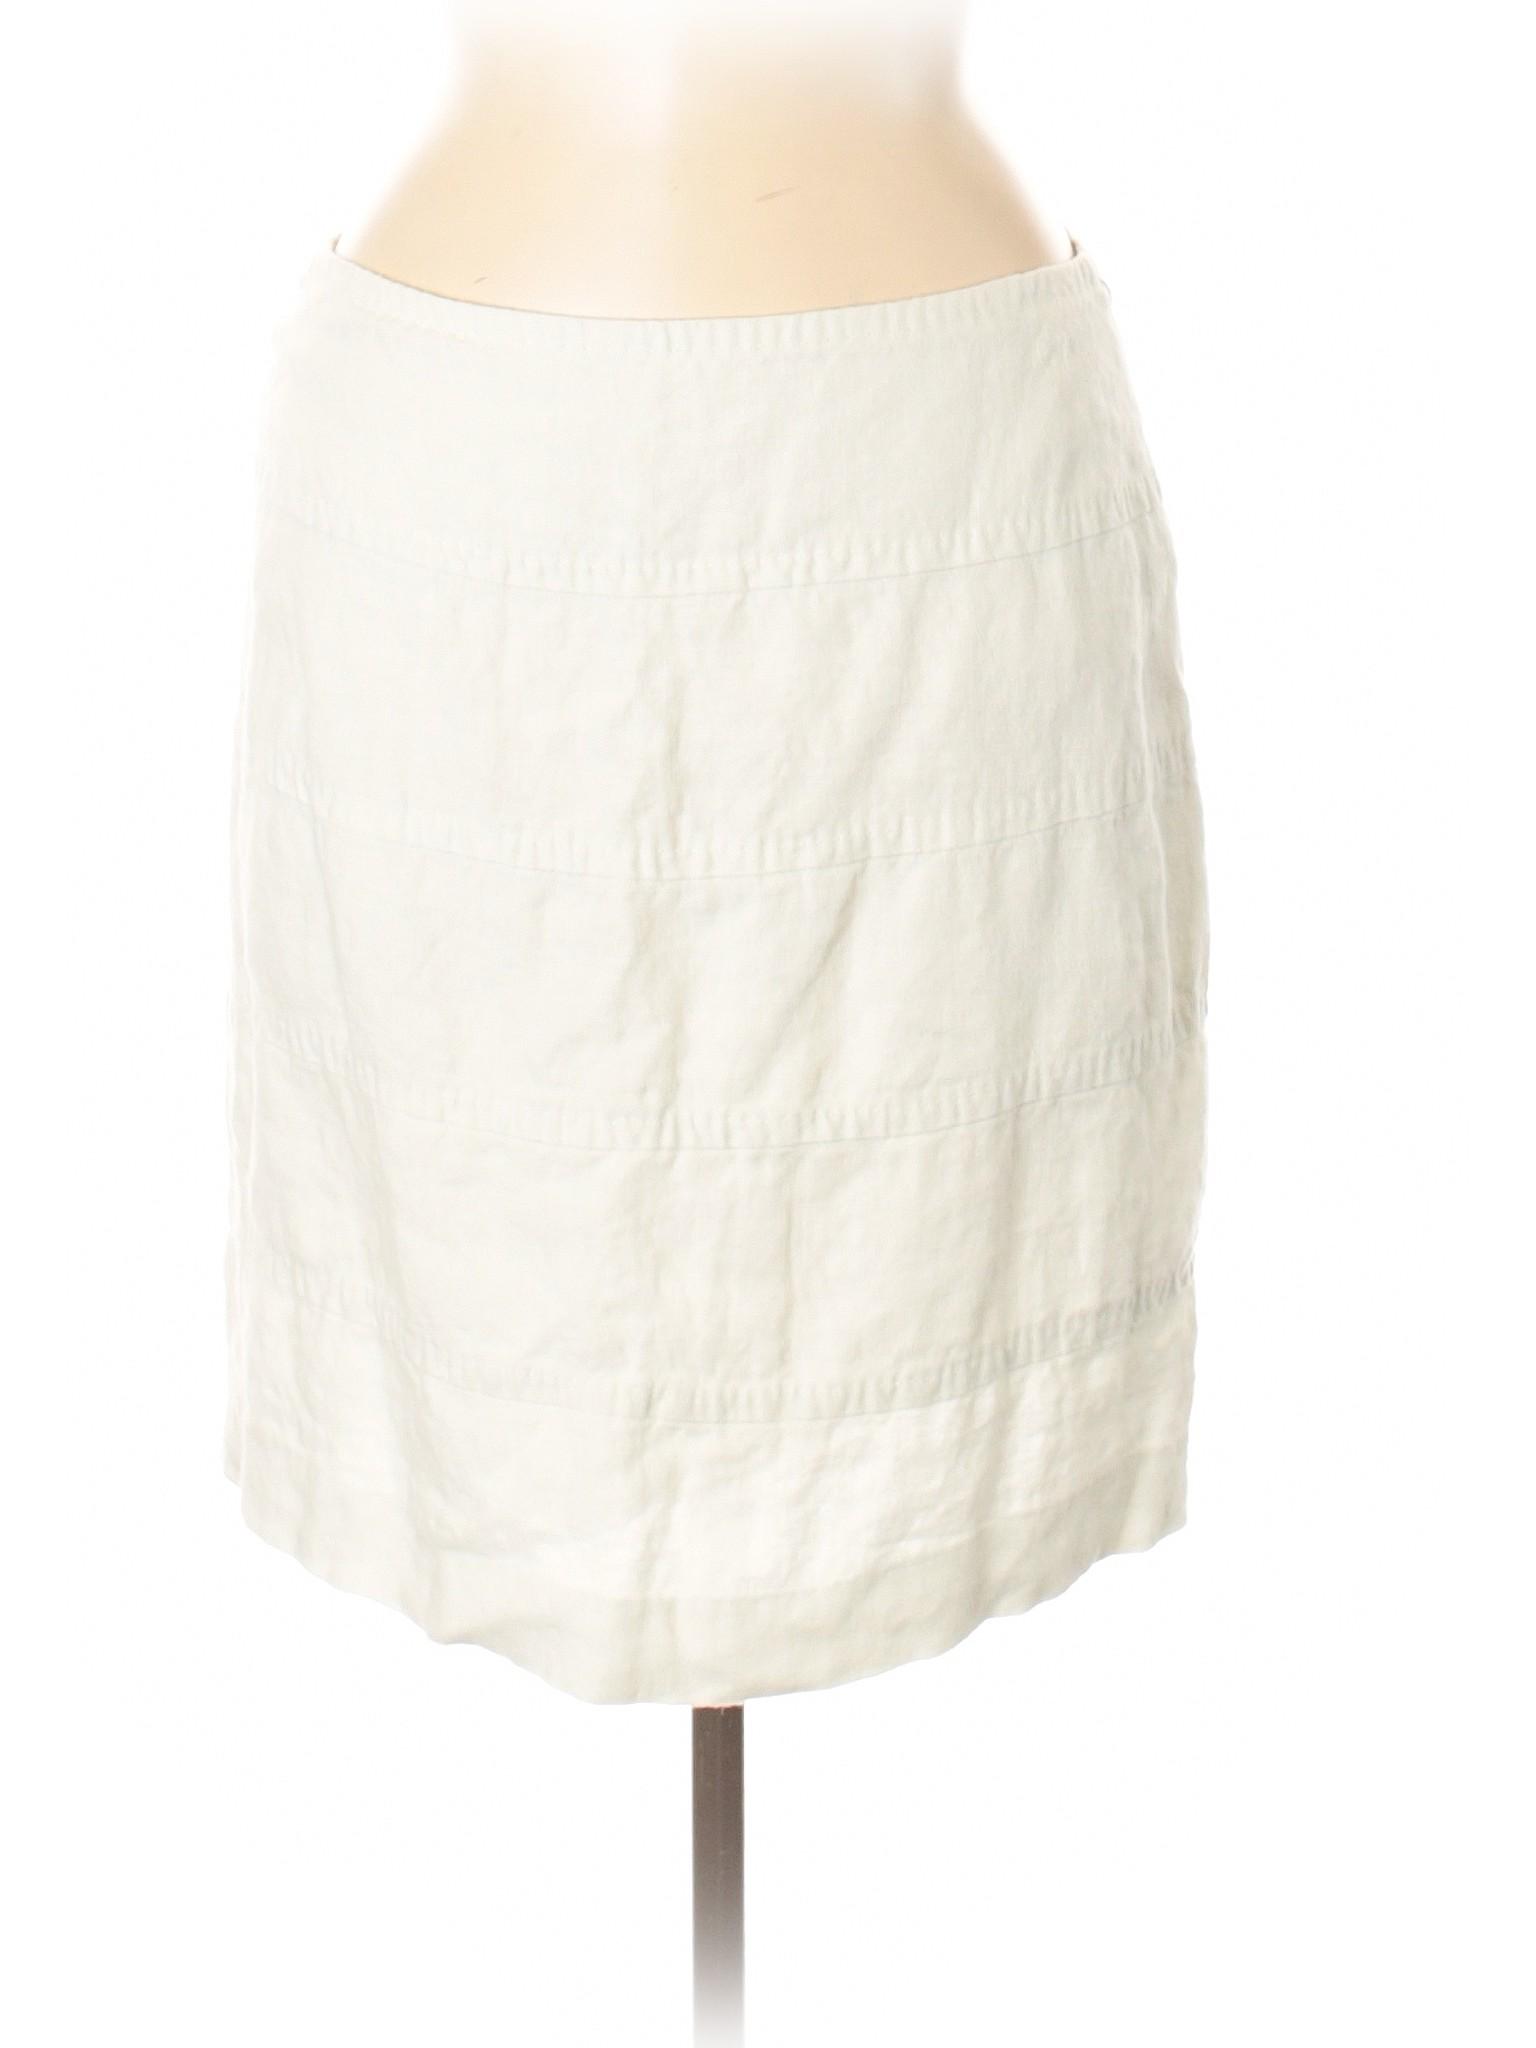 Casual Casual Casual Skirt Skirt Boutique Boutique Boutique Skirt Boutique Skirt Casual OSfSZ